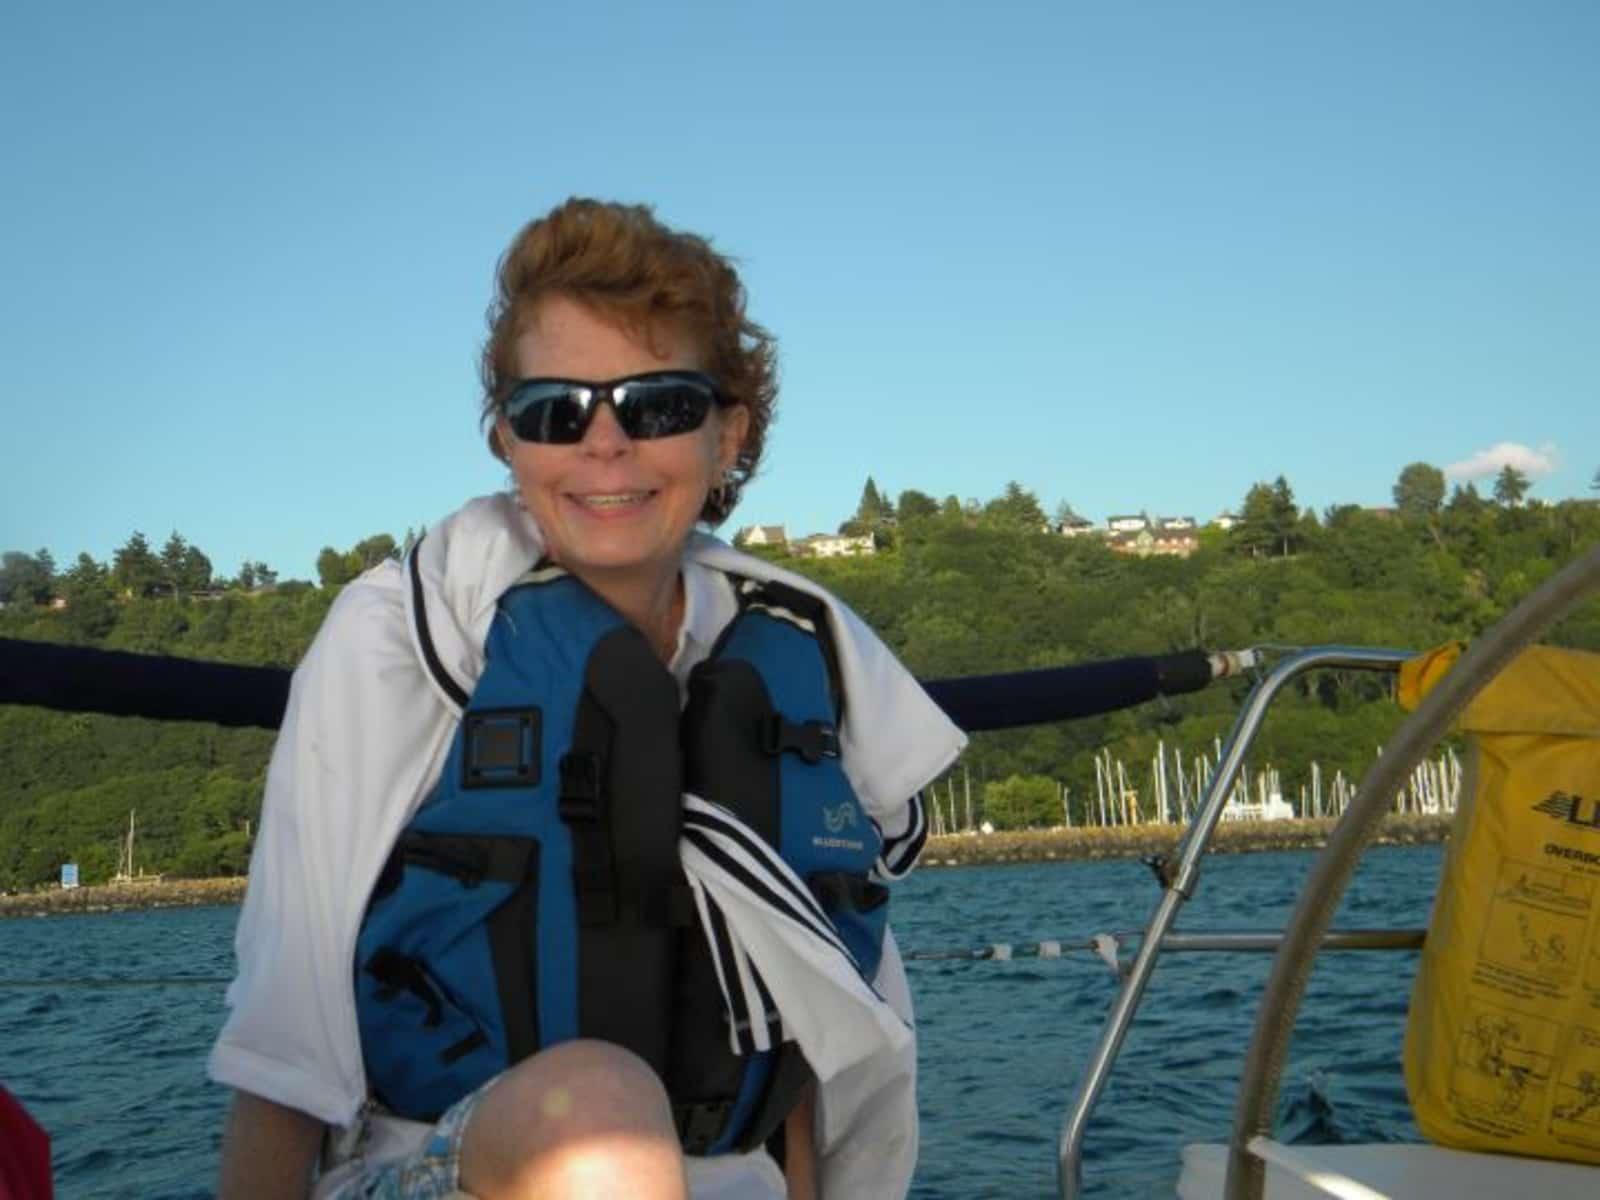 Cyndy from Seattle, Washington, United States